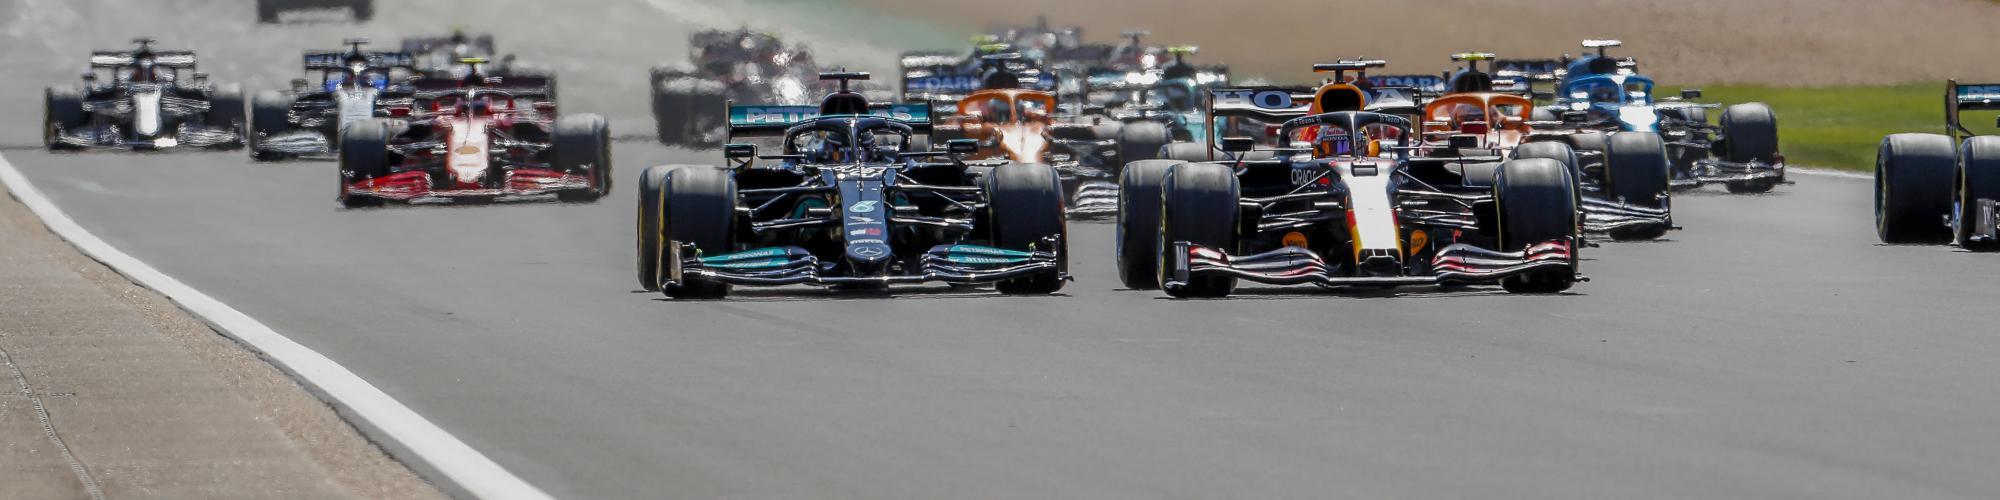 Leading Formula One Team